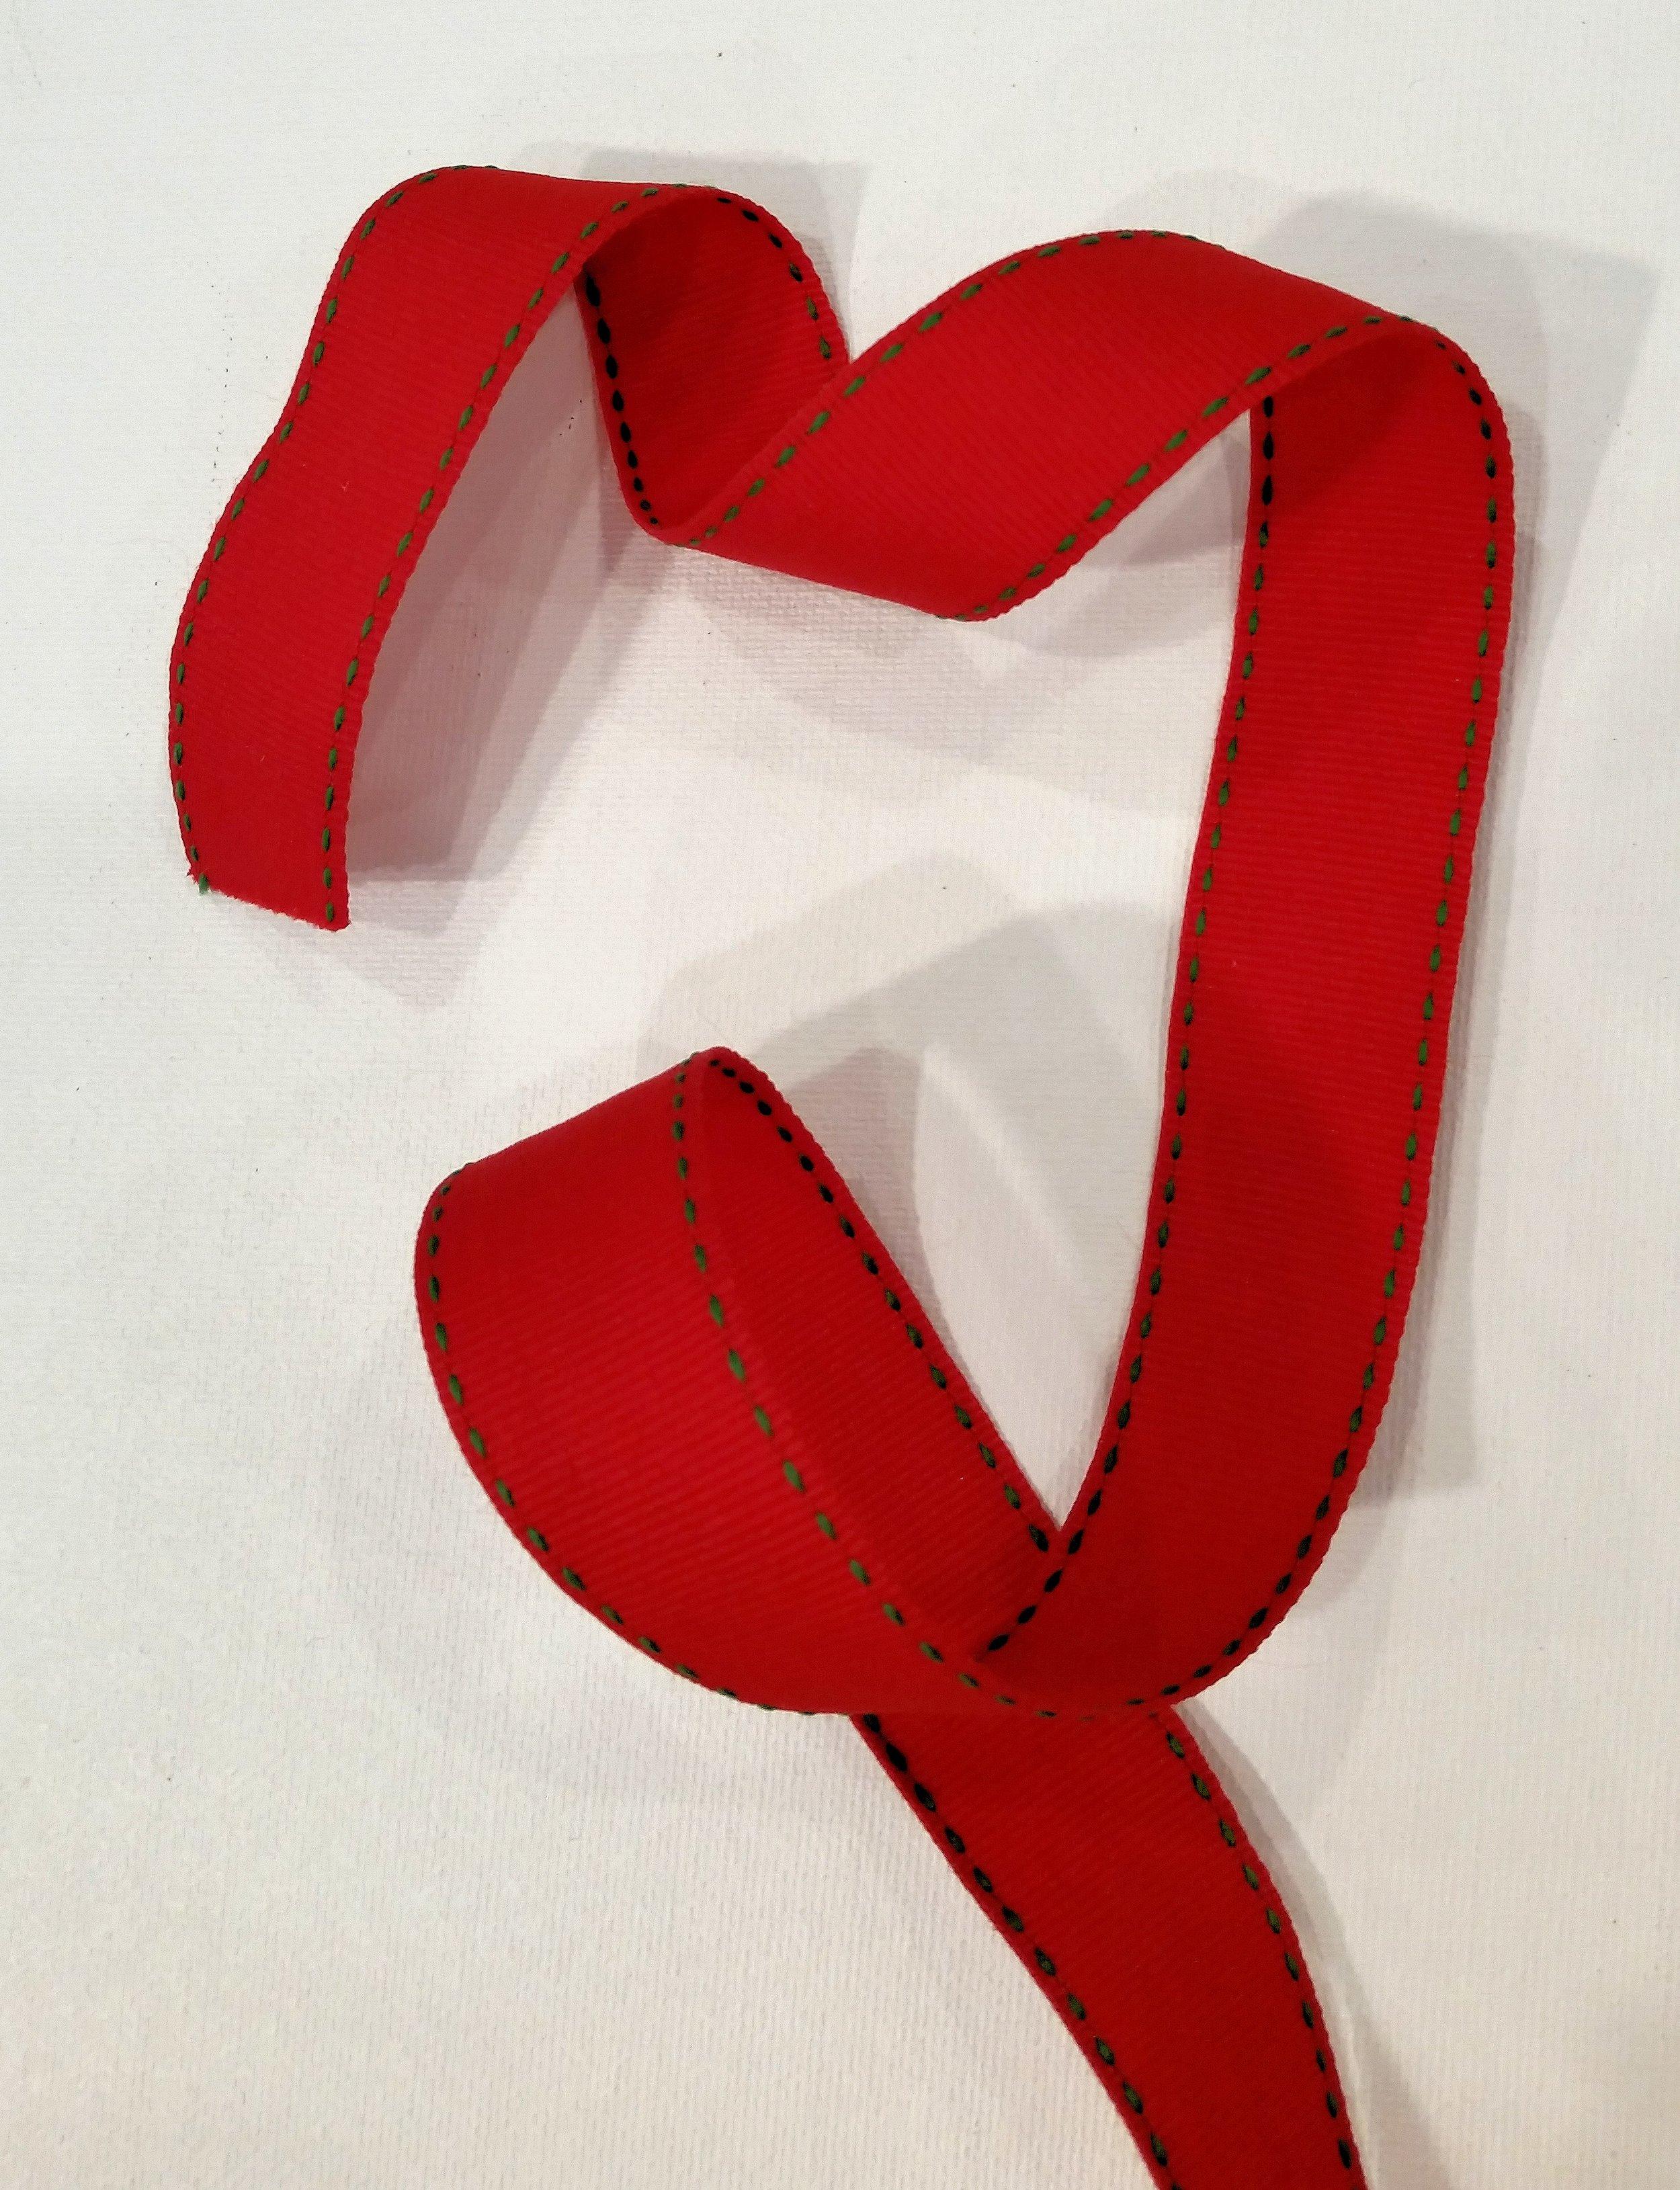 Stitched Edge Red Green Ribbon.jpg